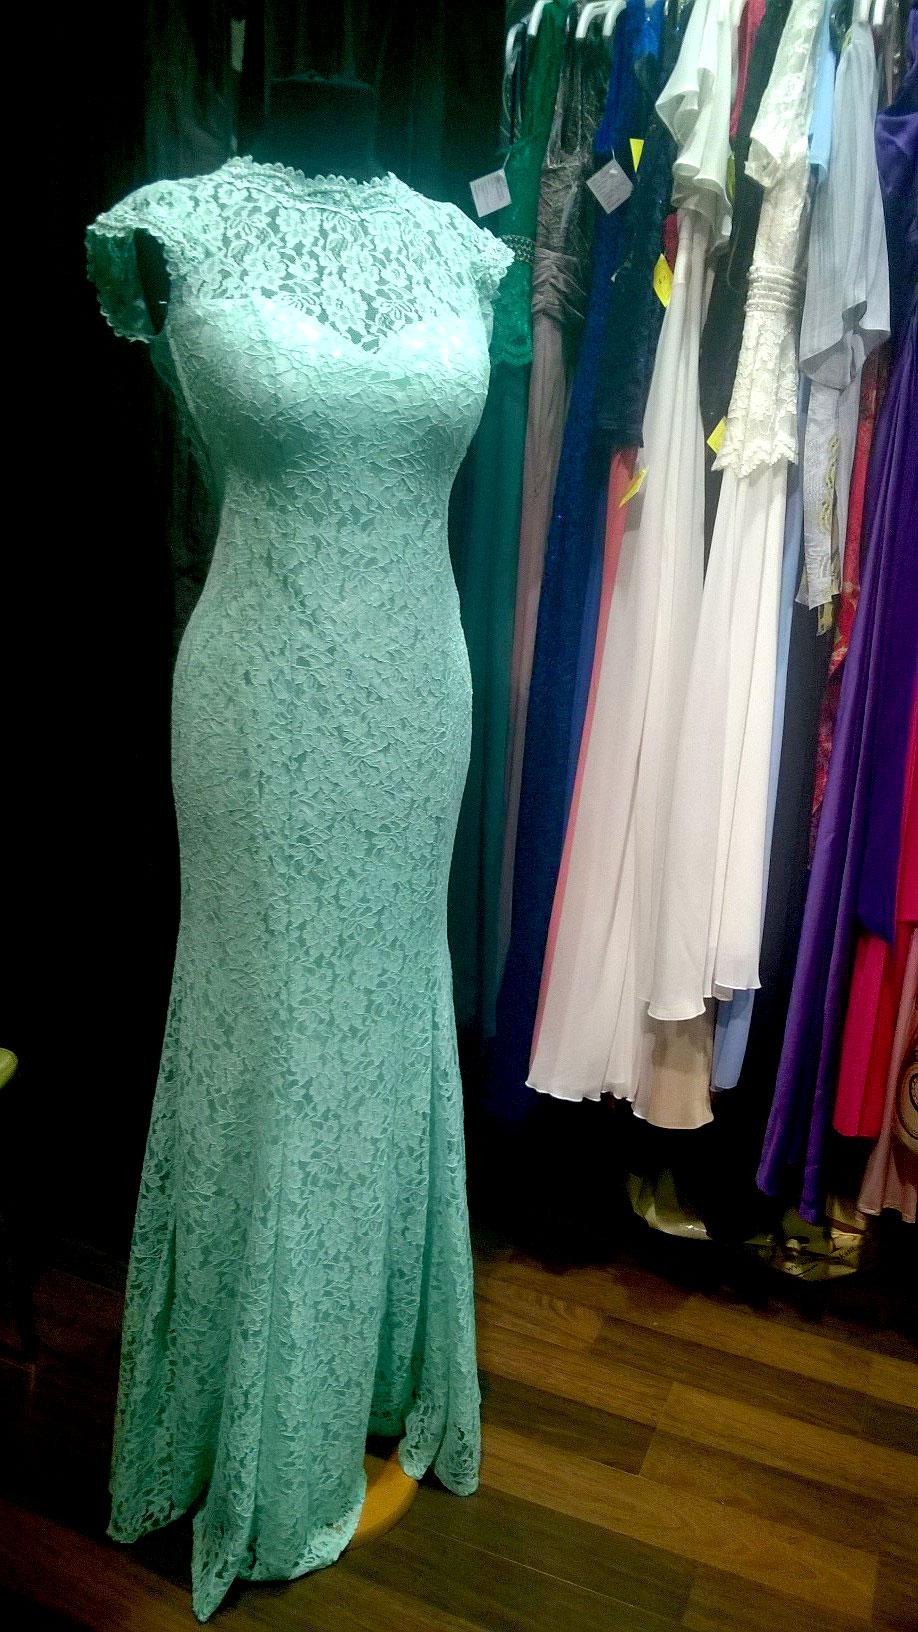 Salon svečanih haljina i odela Par